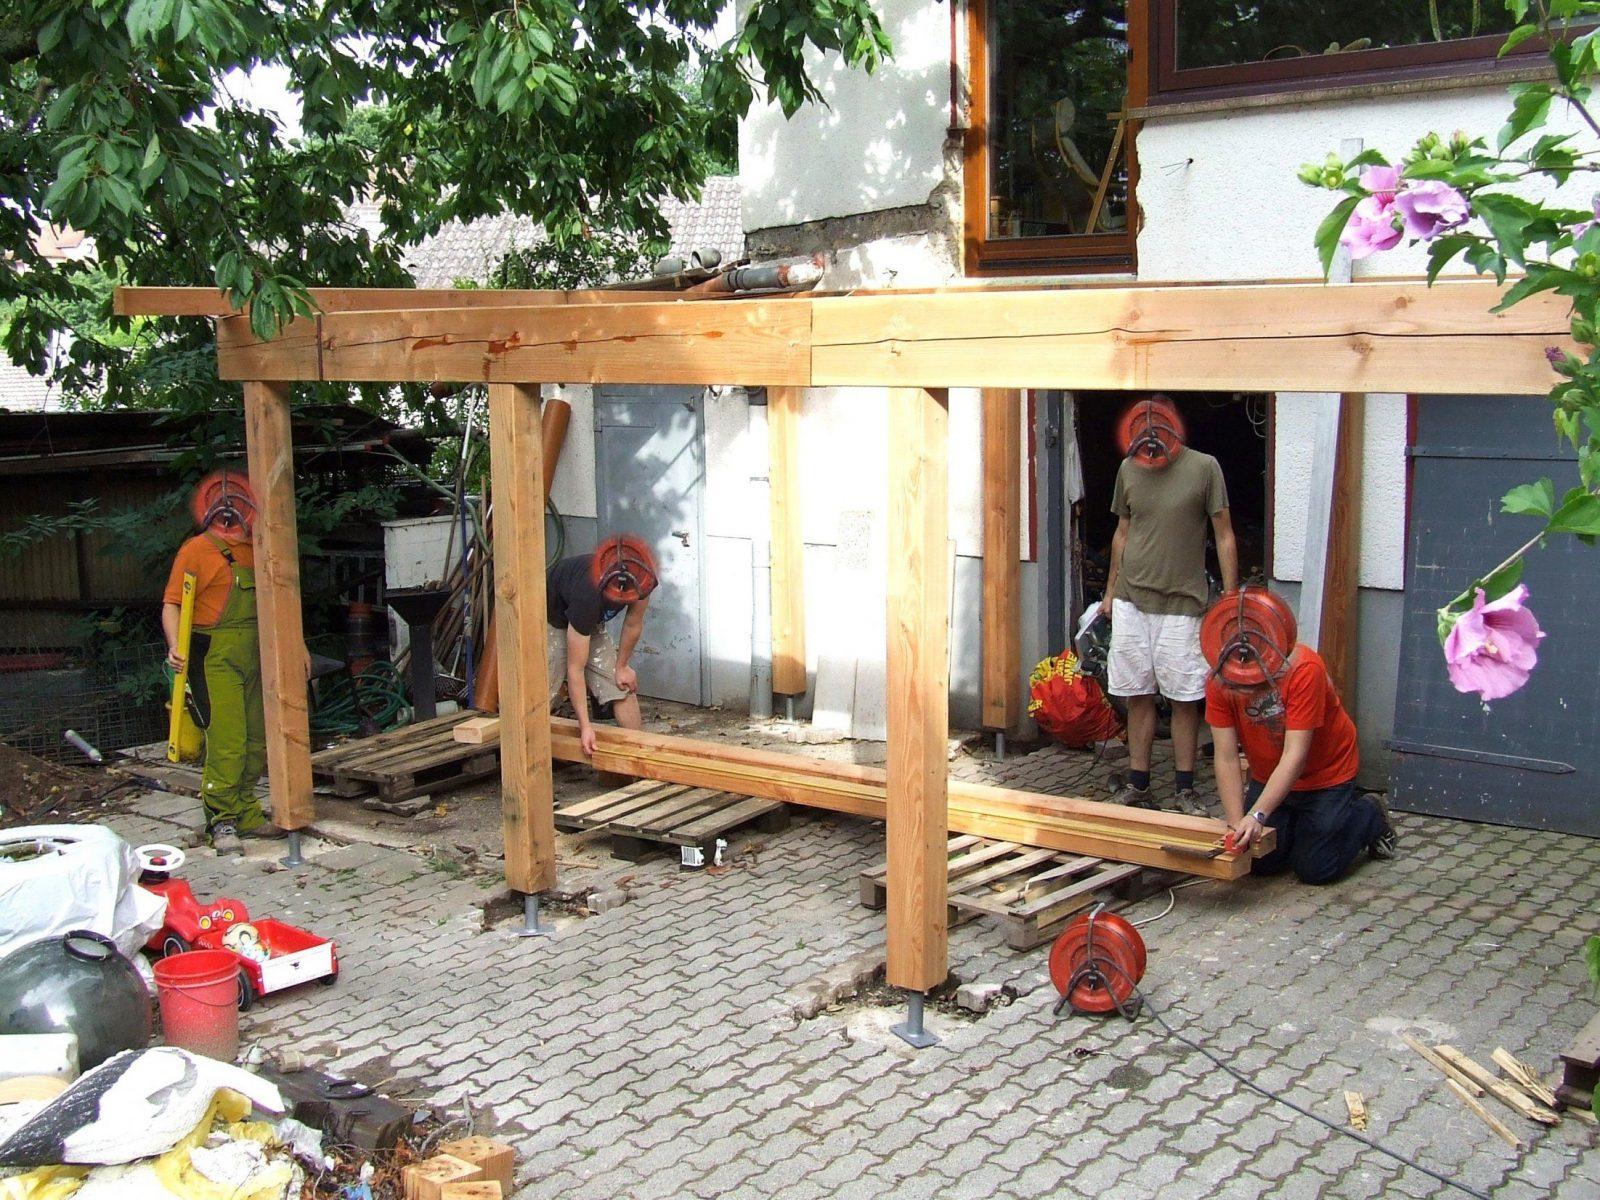 Terrassenuberdachung Selber Bauen Bauanleitung Holz von Vordach Selber Bauen Bauanleitung Bild